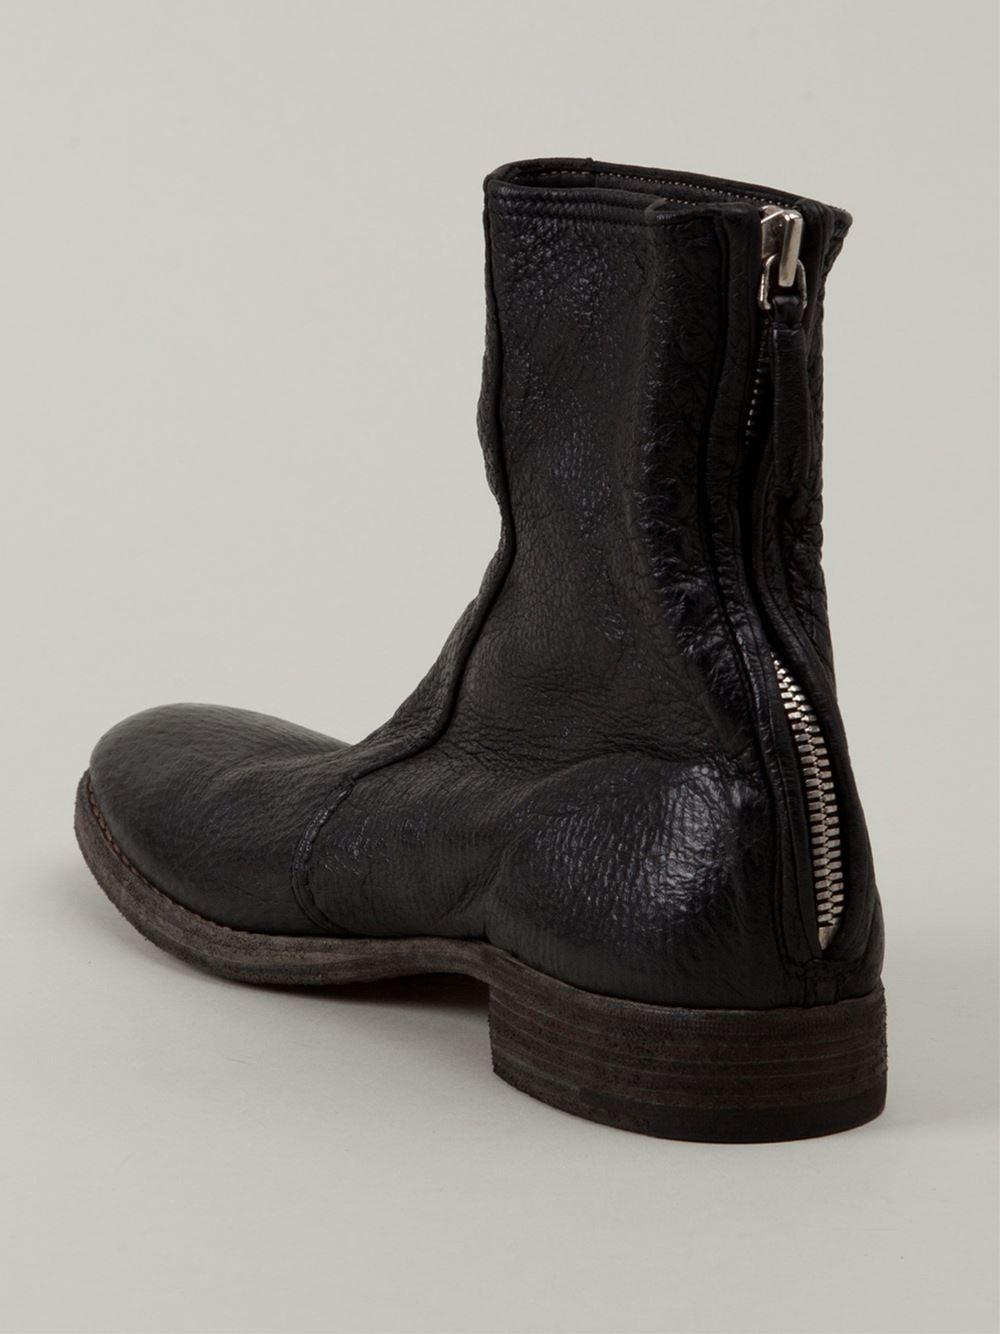 Premiata Ankle Boots CZc8v